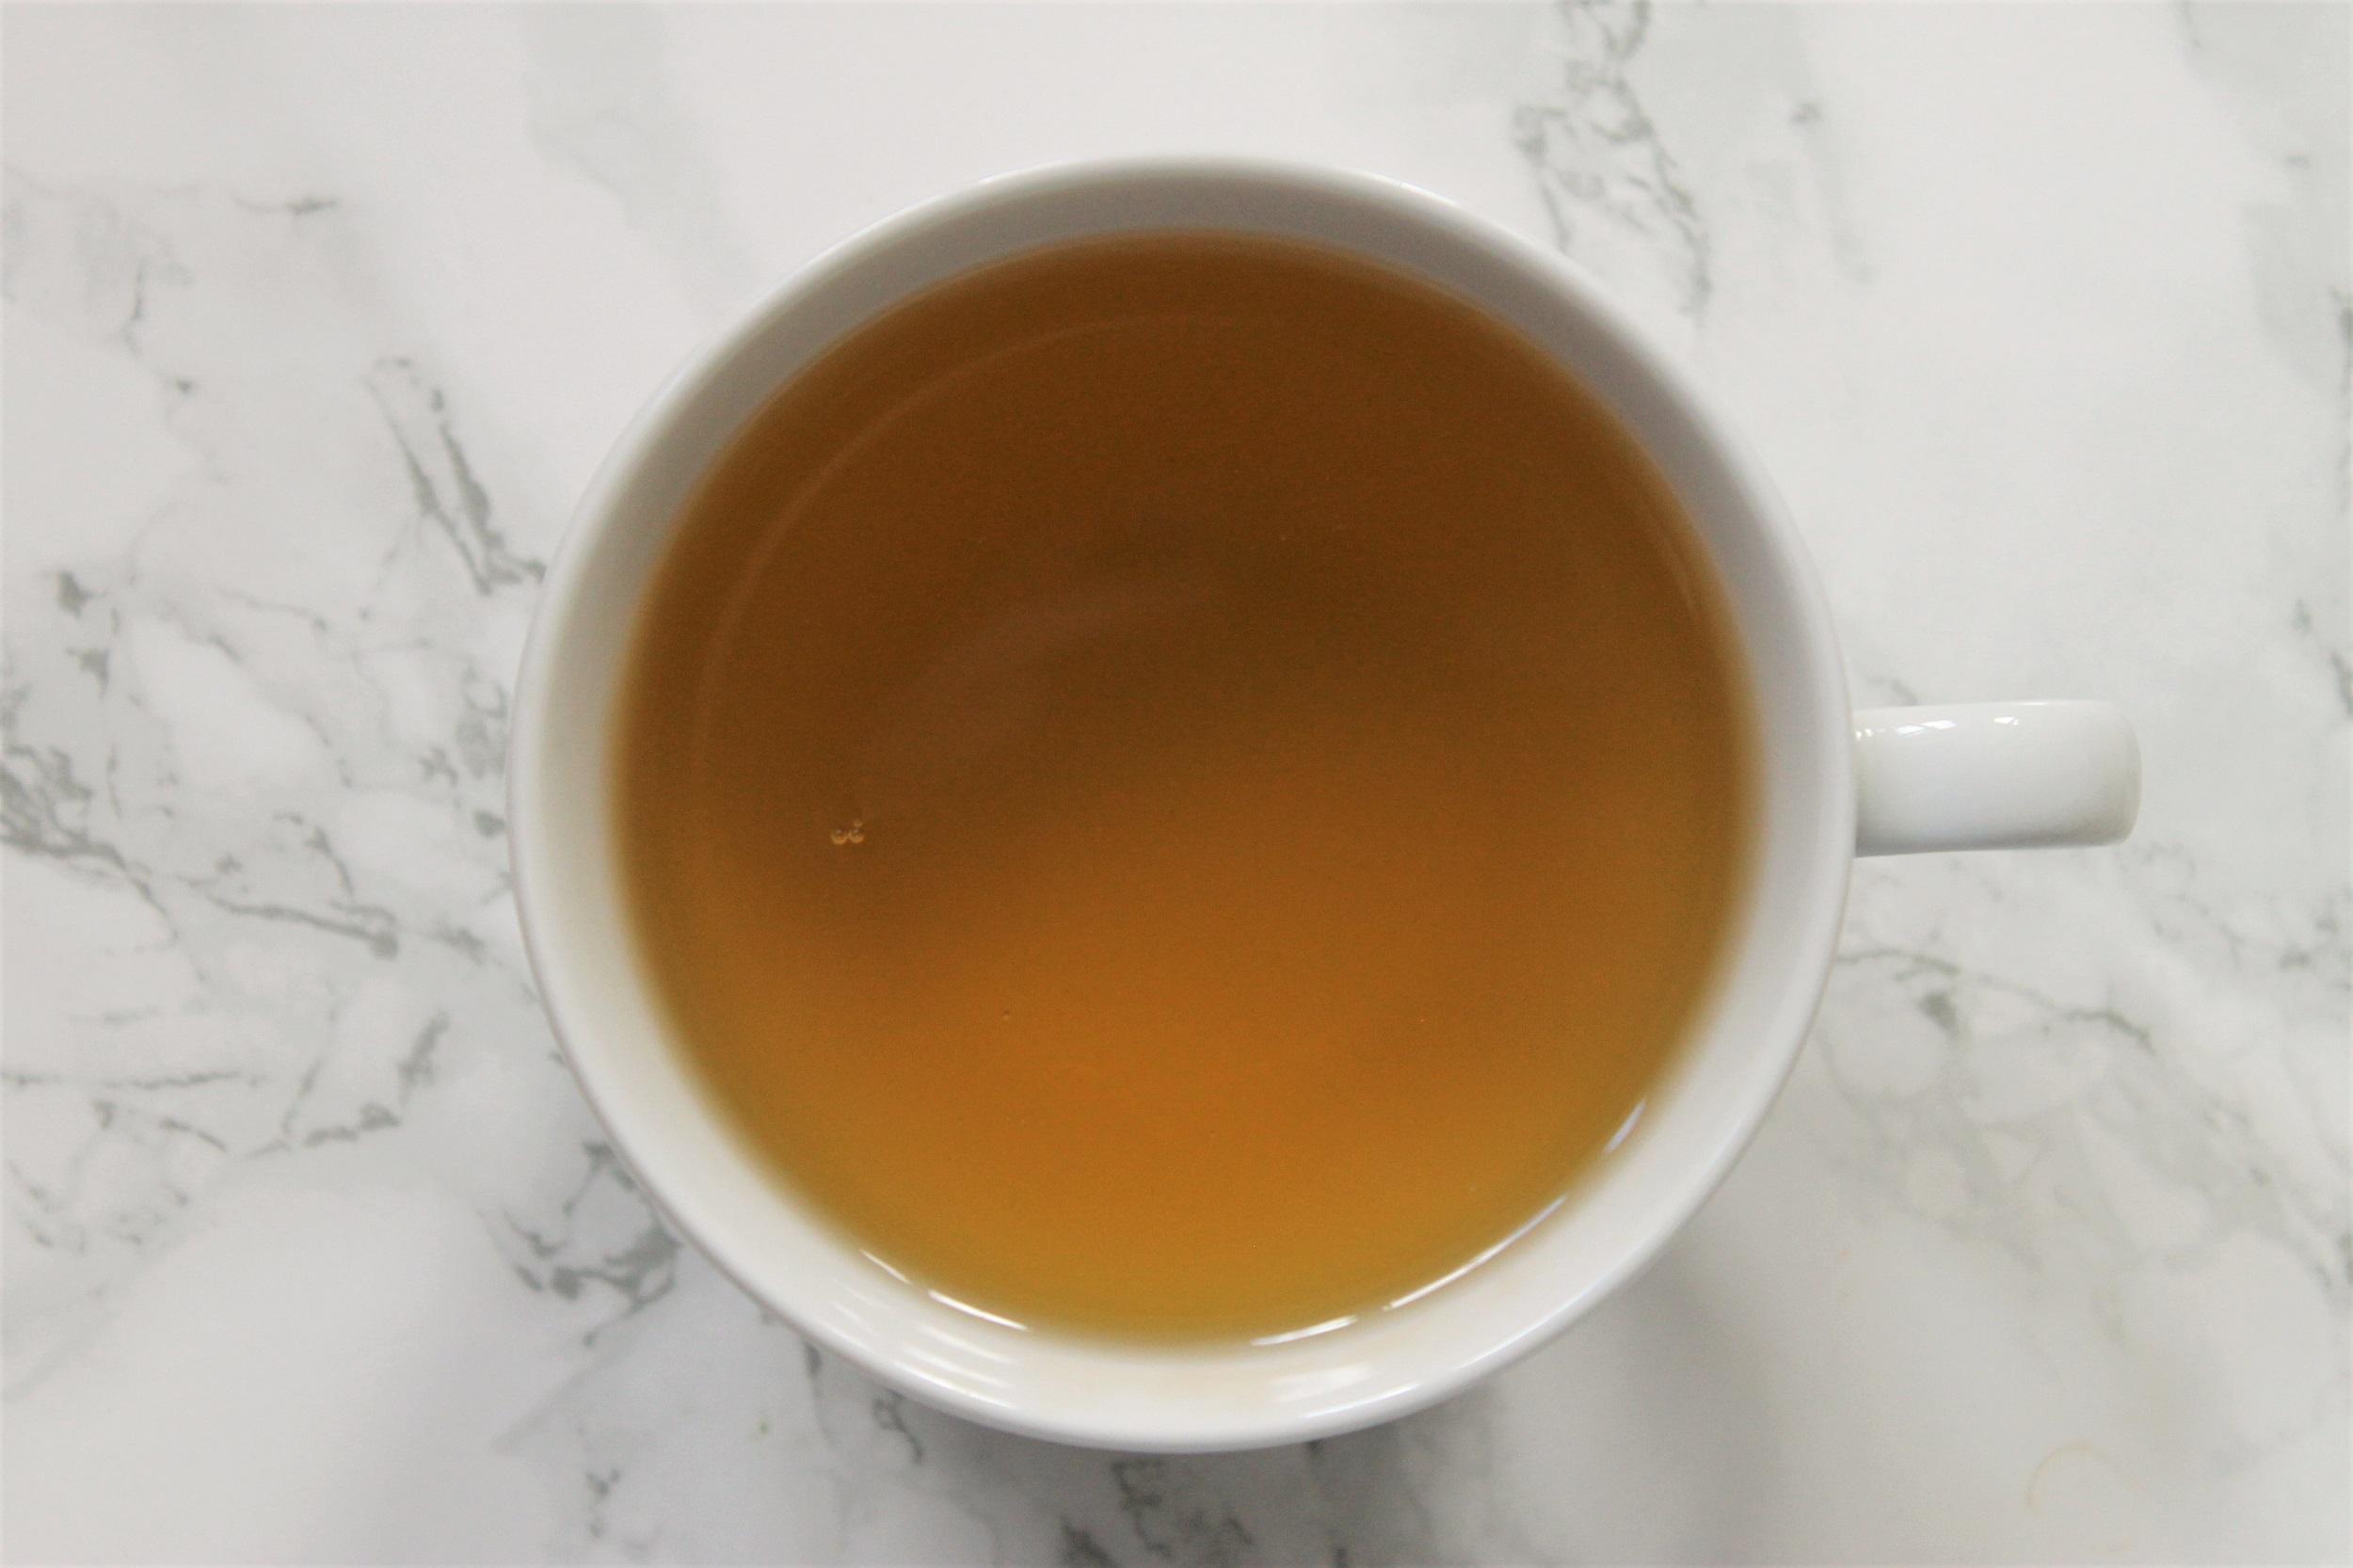 pure sri lanka green tea in teacup